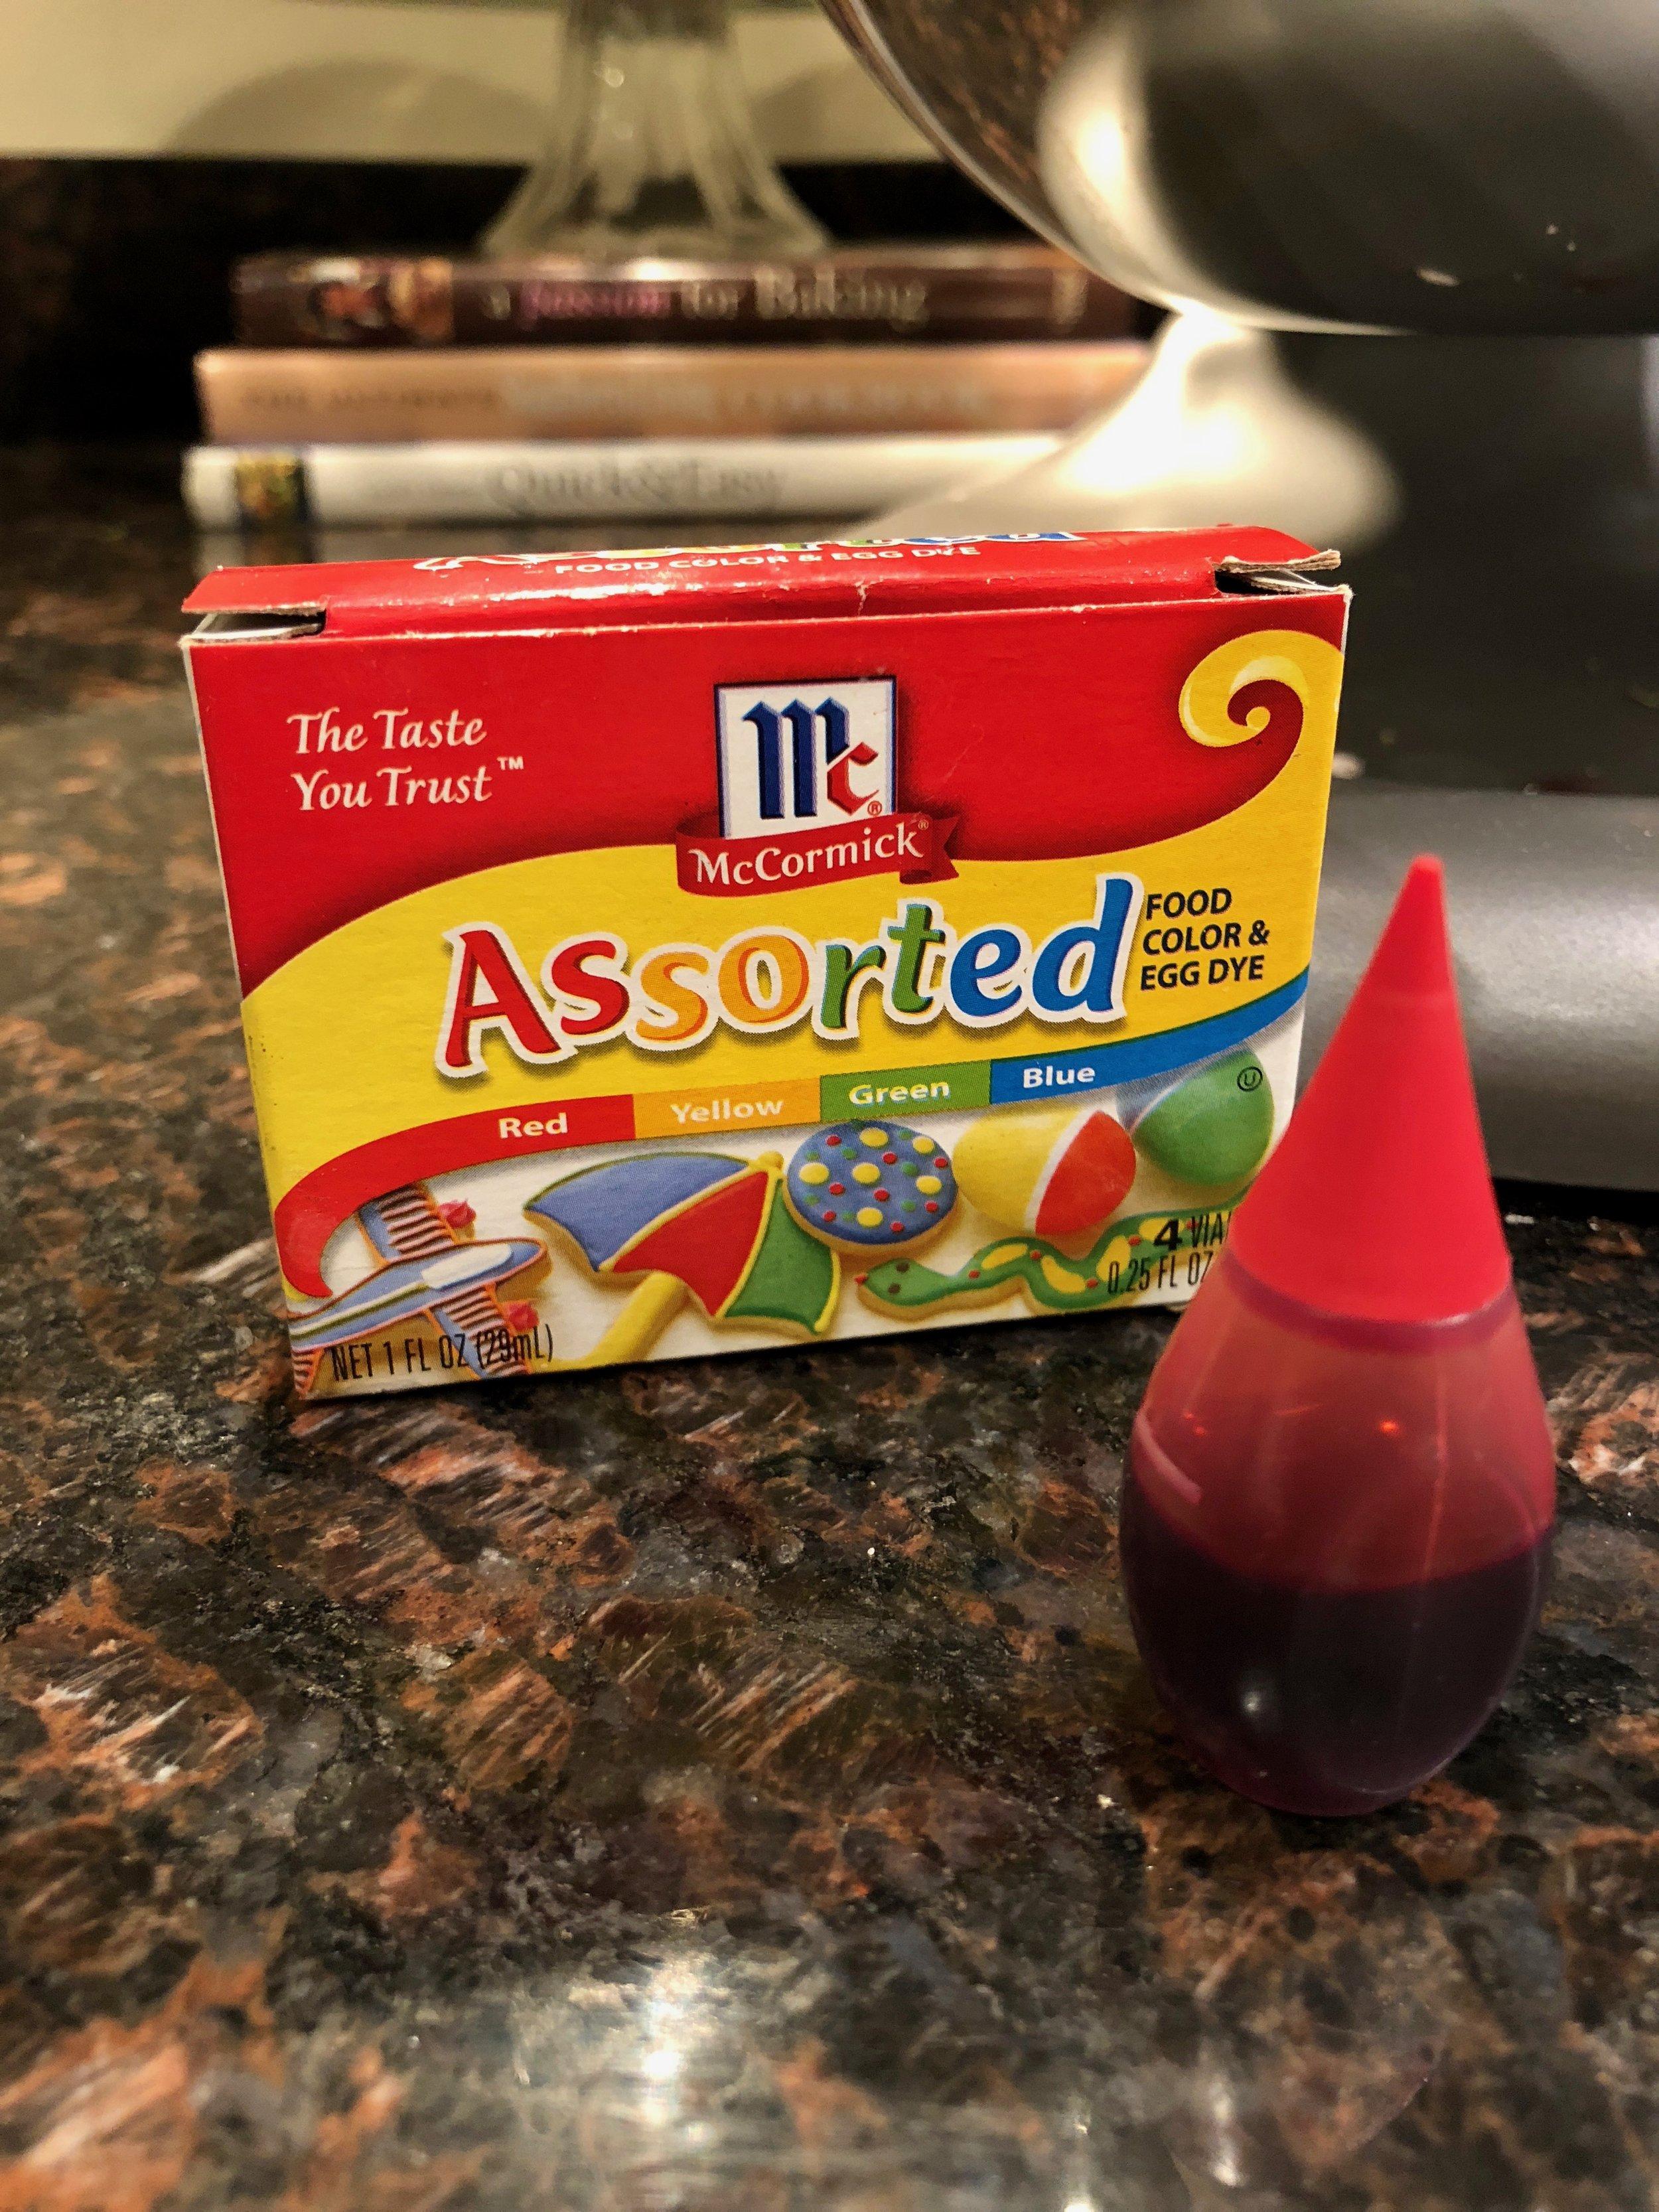 red food coloring mccormick.jpg